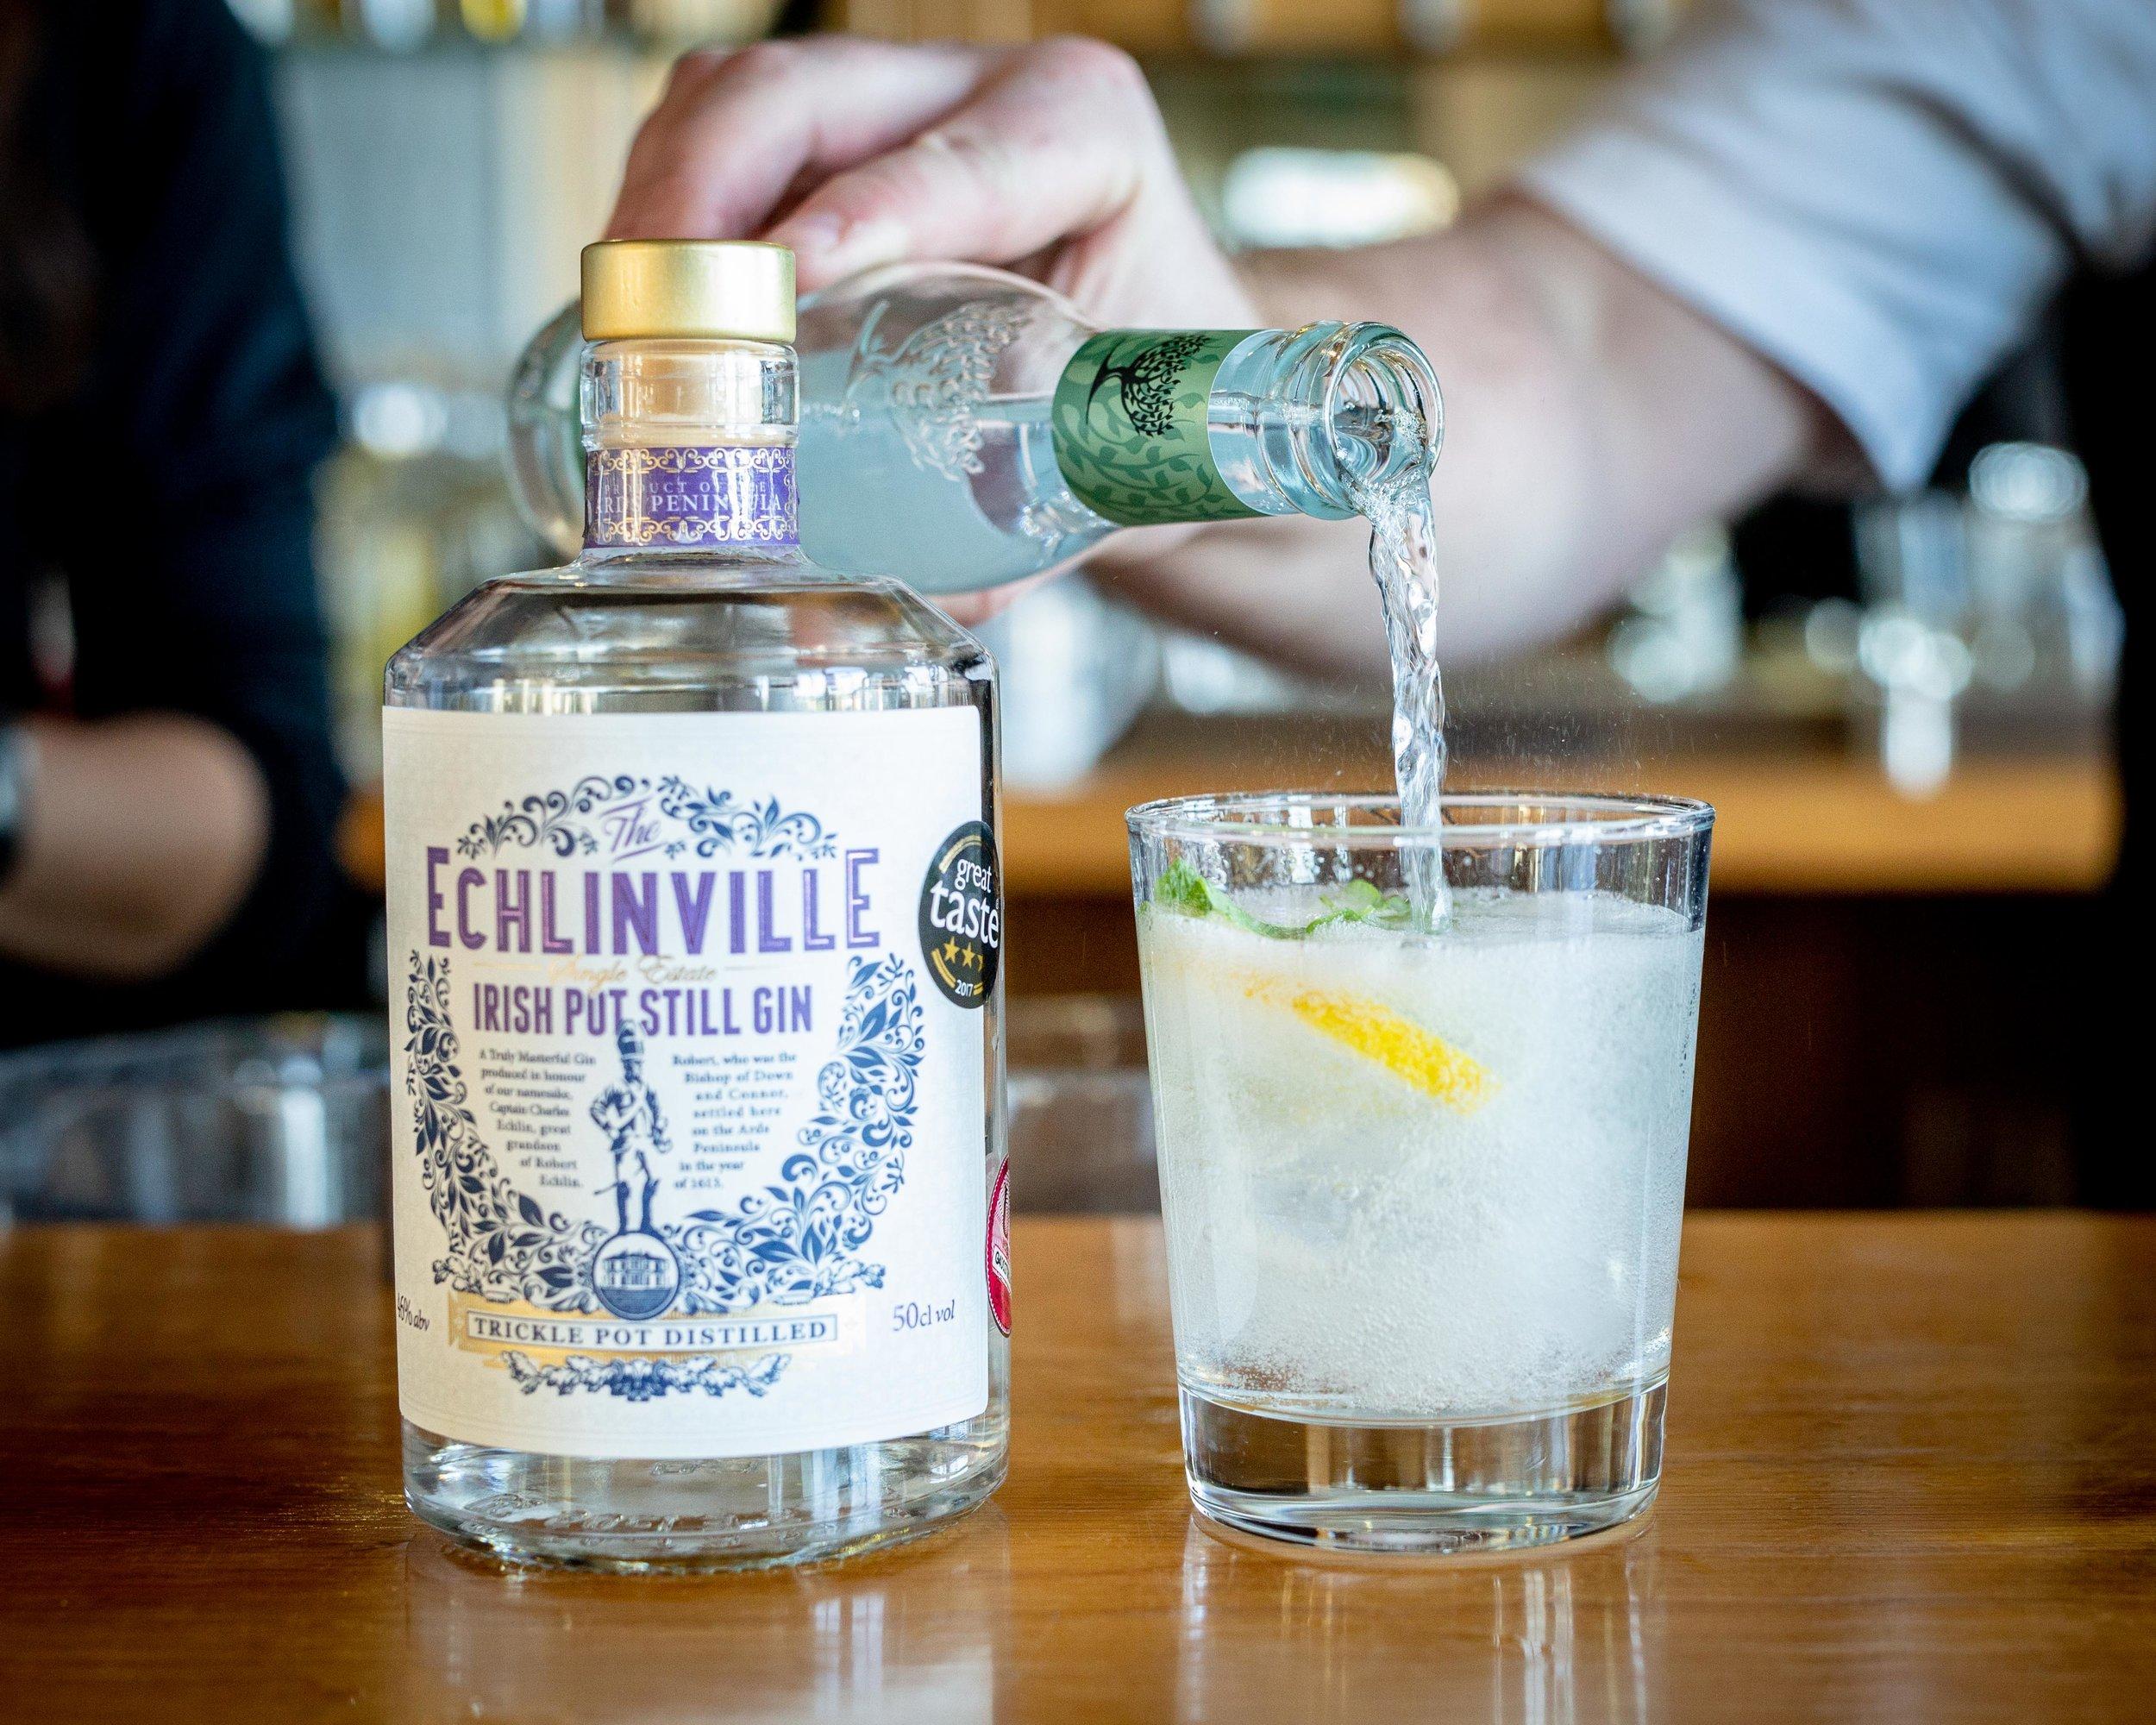 Echlinville distillery, Kircubbin